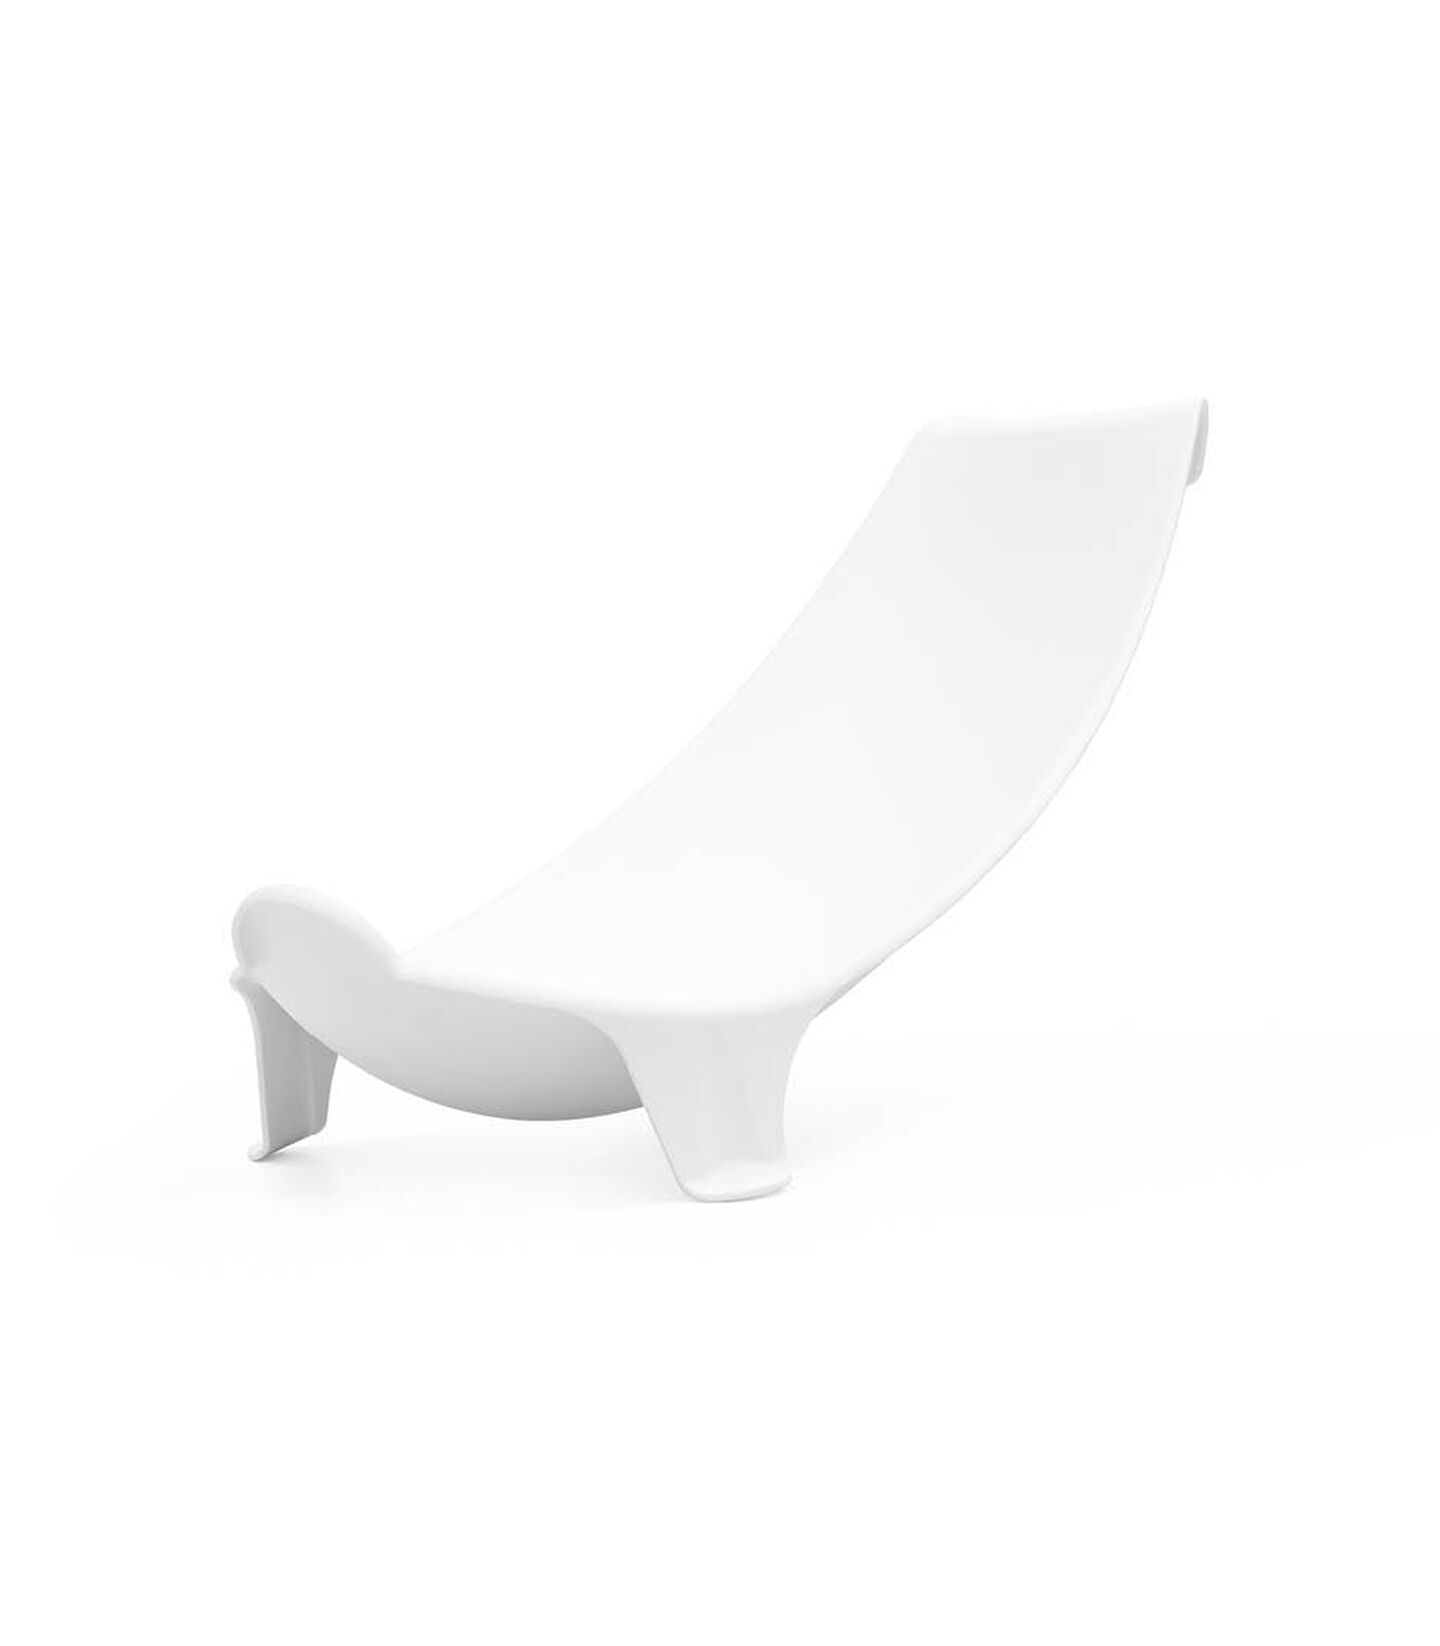 Stokke® Flexi Bath® Newborn Support, , mainview view 2